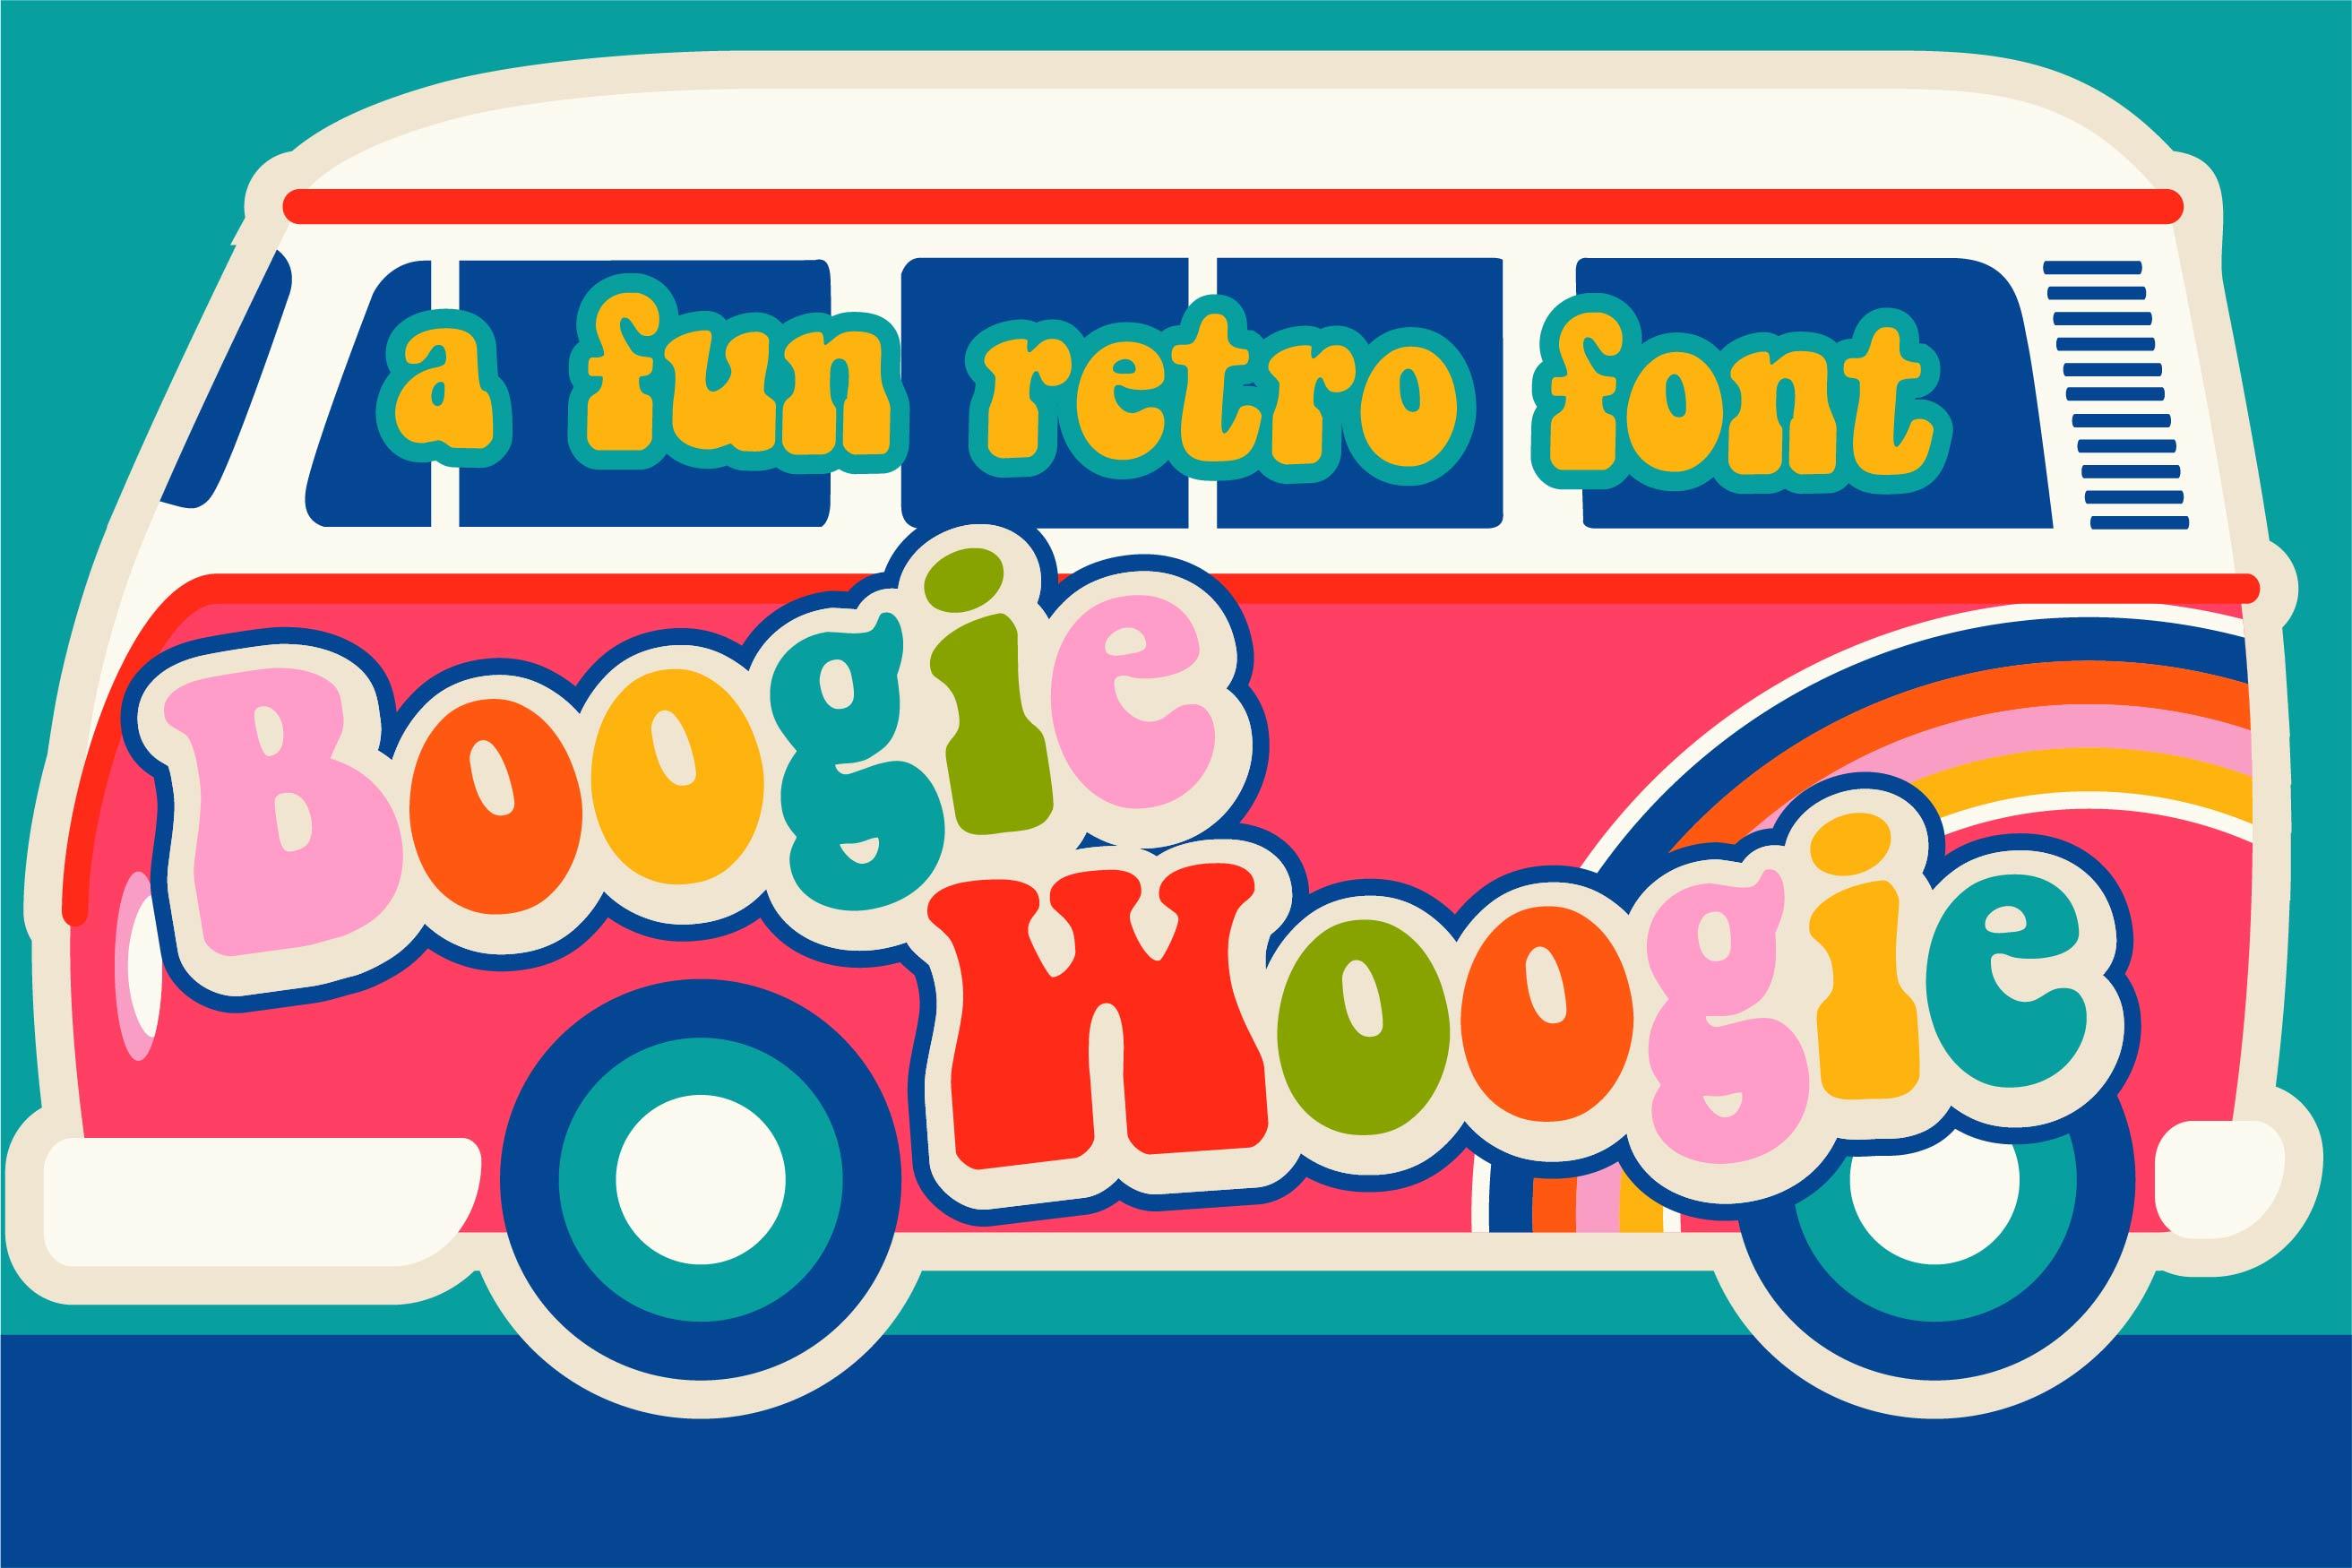 PN Boogie Woogie example image 1